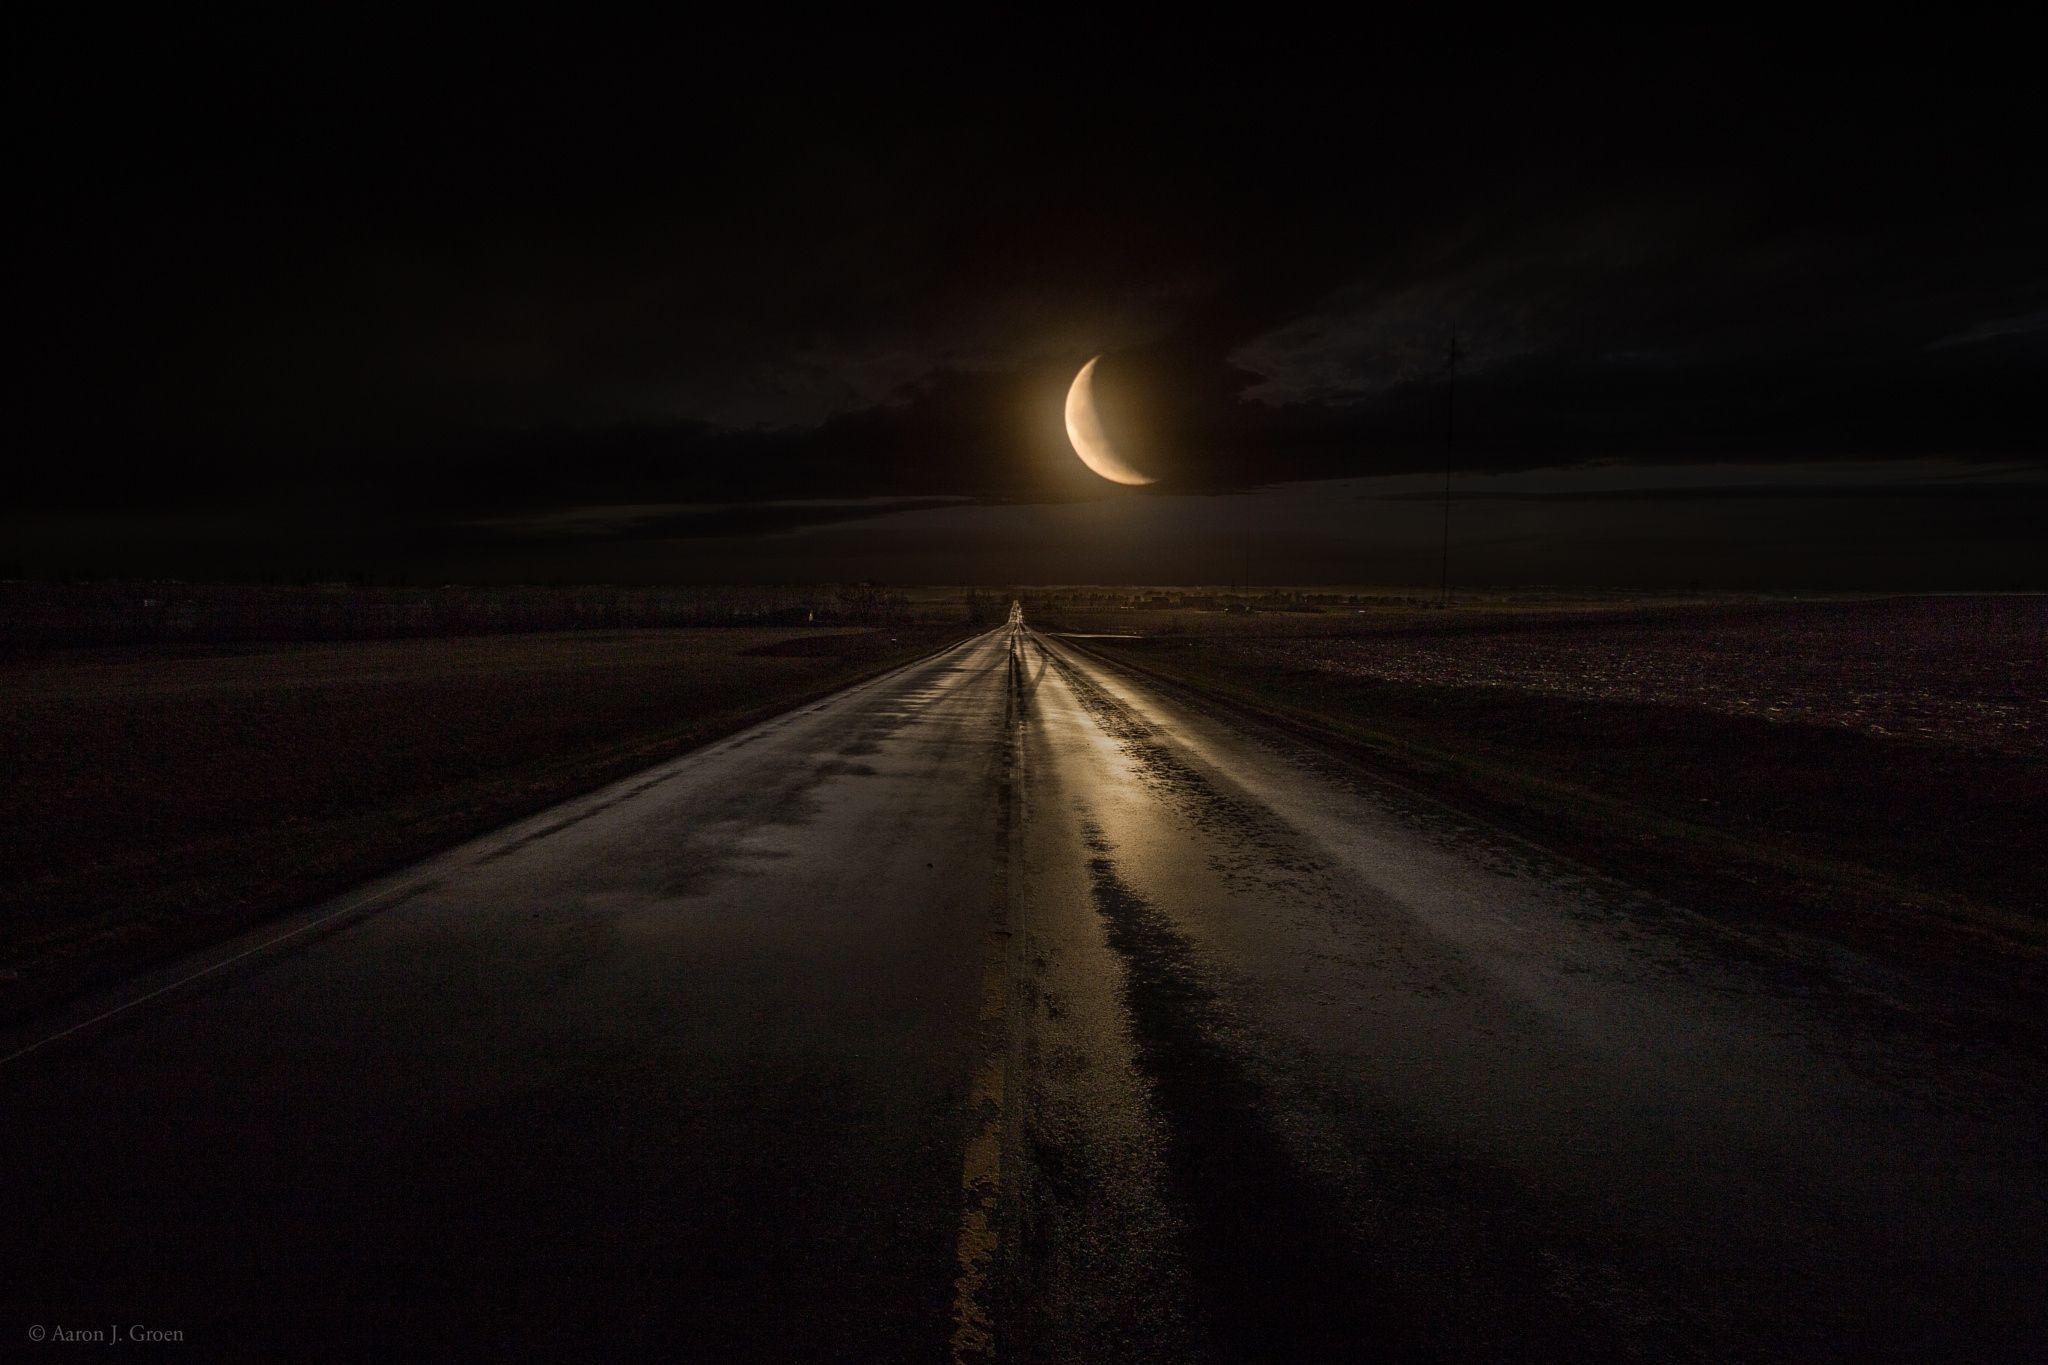 Midnight Highway by Aaron J. Groen on 500px